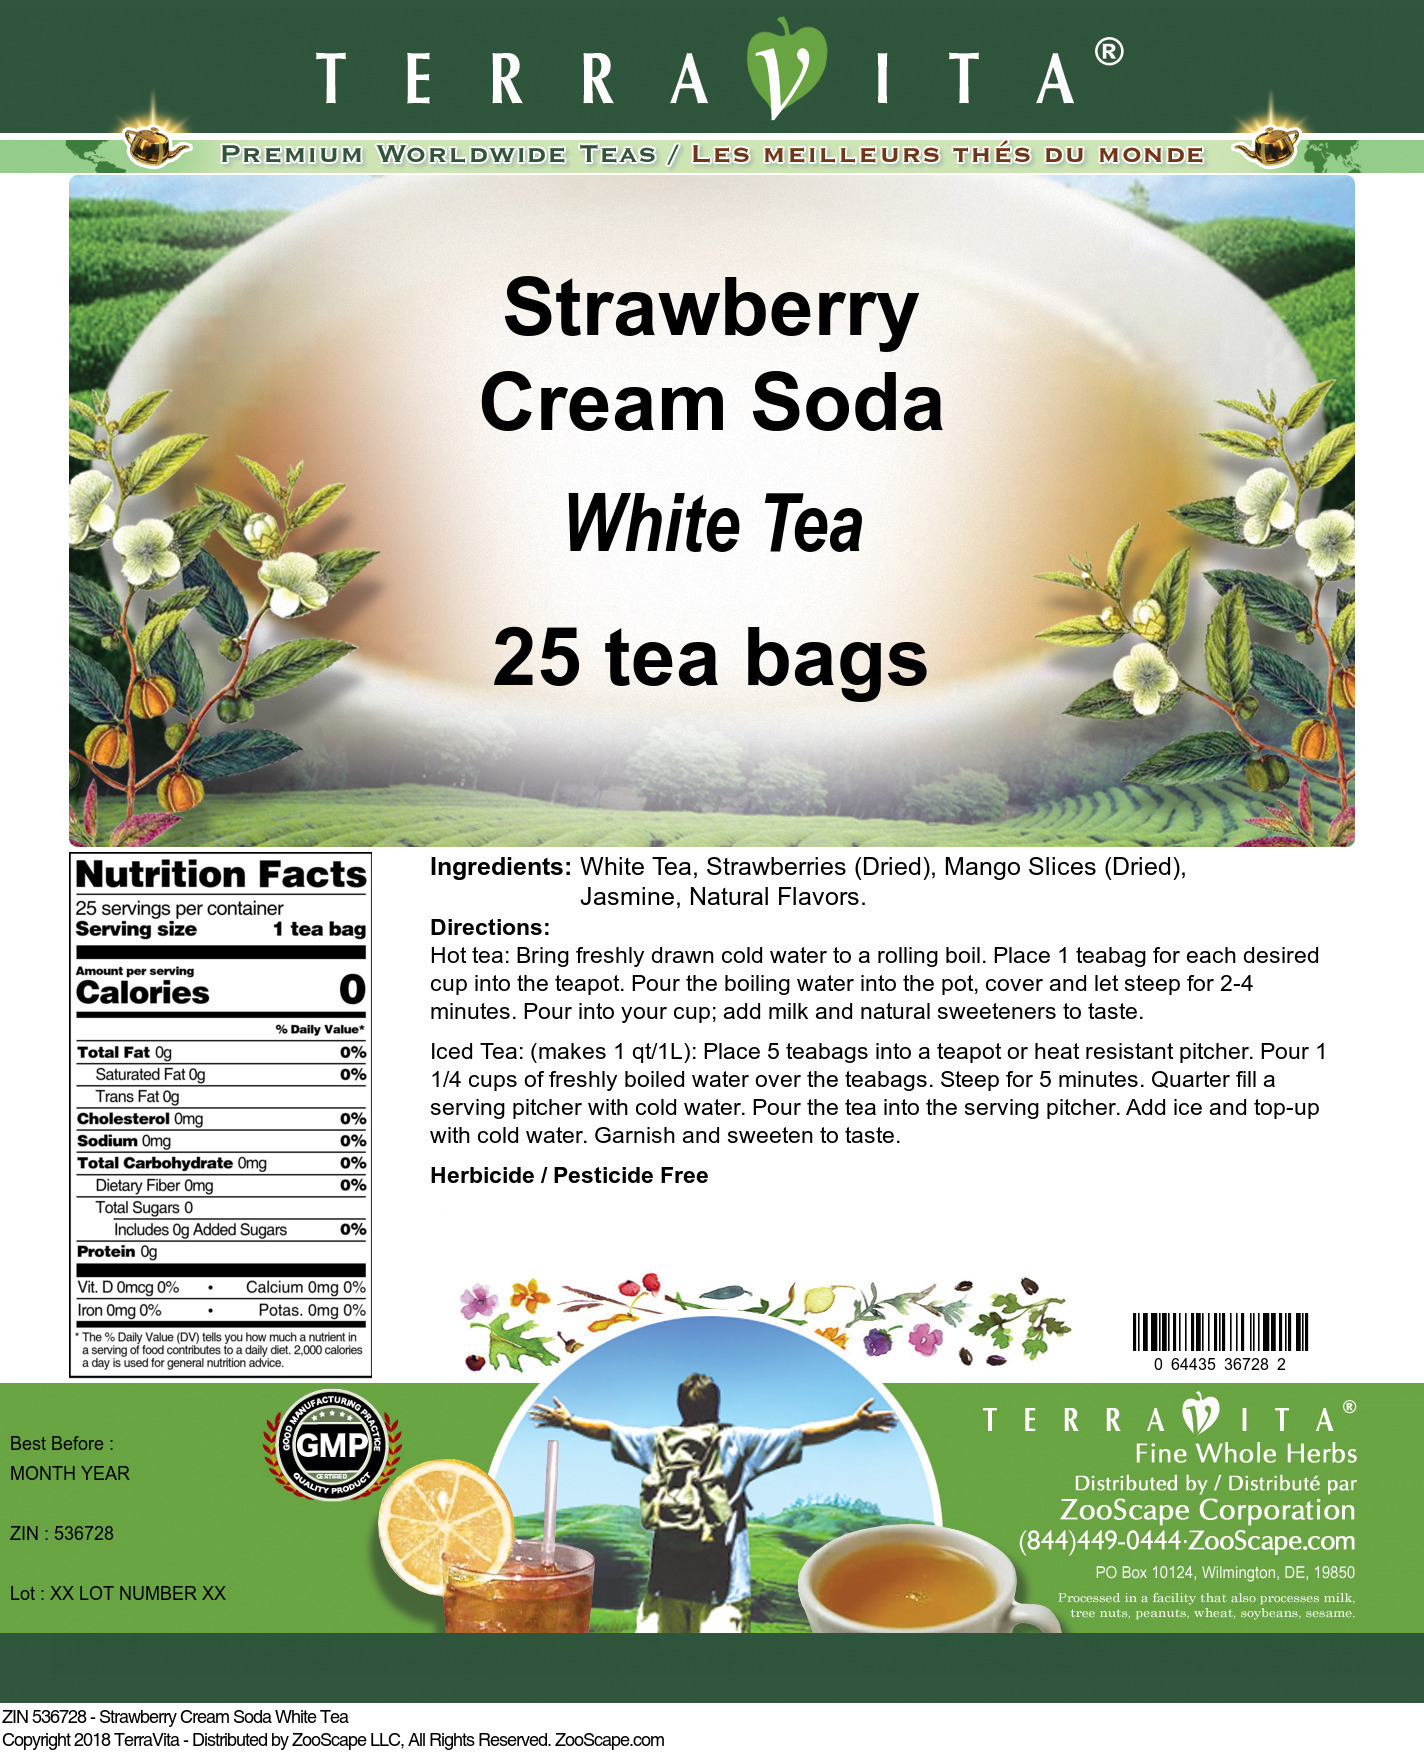 Strawberry Cream Soda White Tea